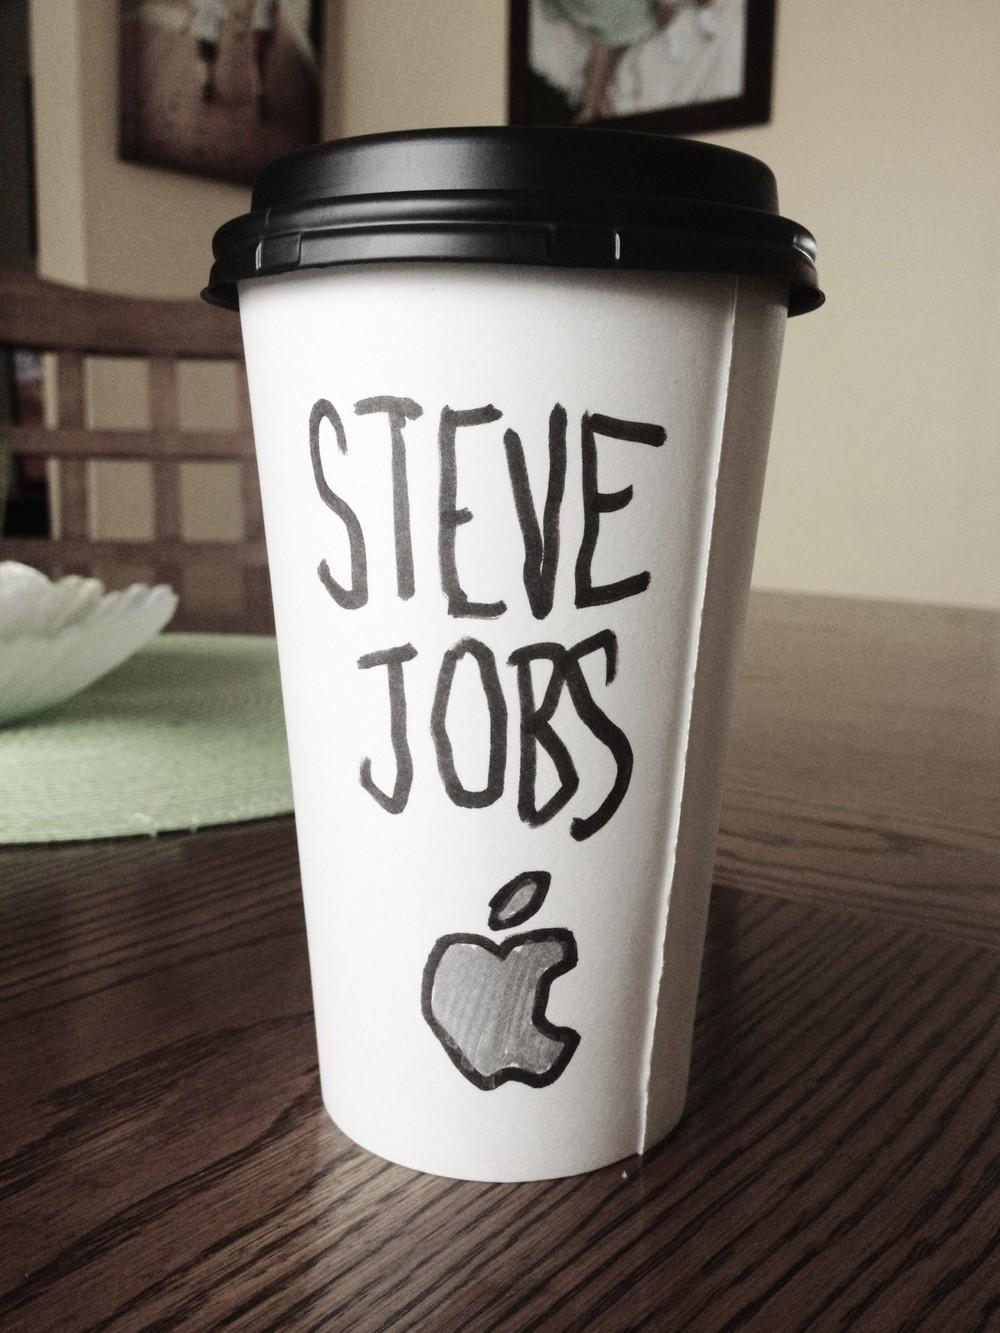 steve-jobs-cartoon-coffee-cup-name-apple.jpg